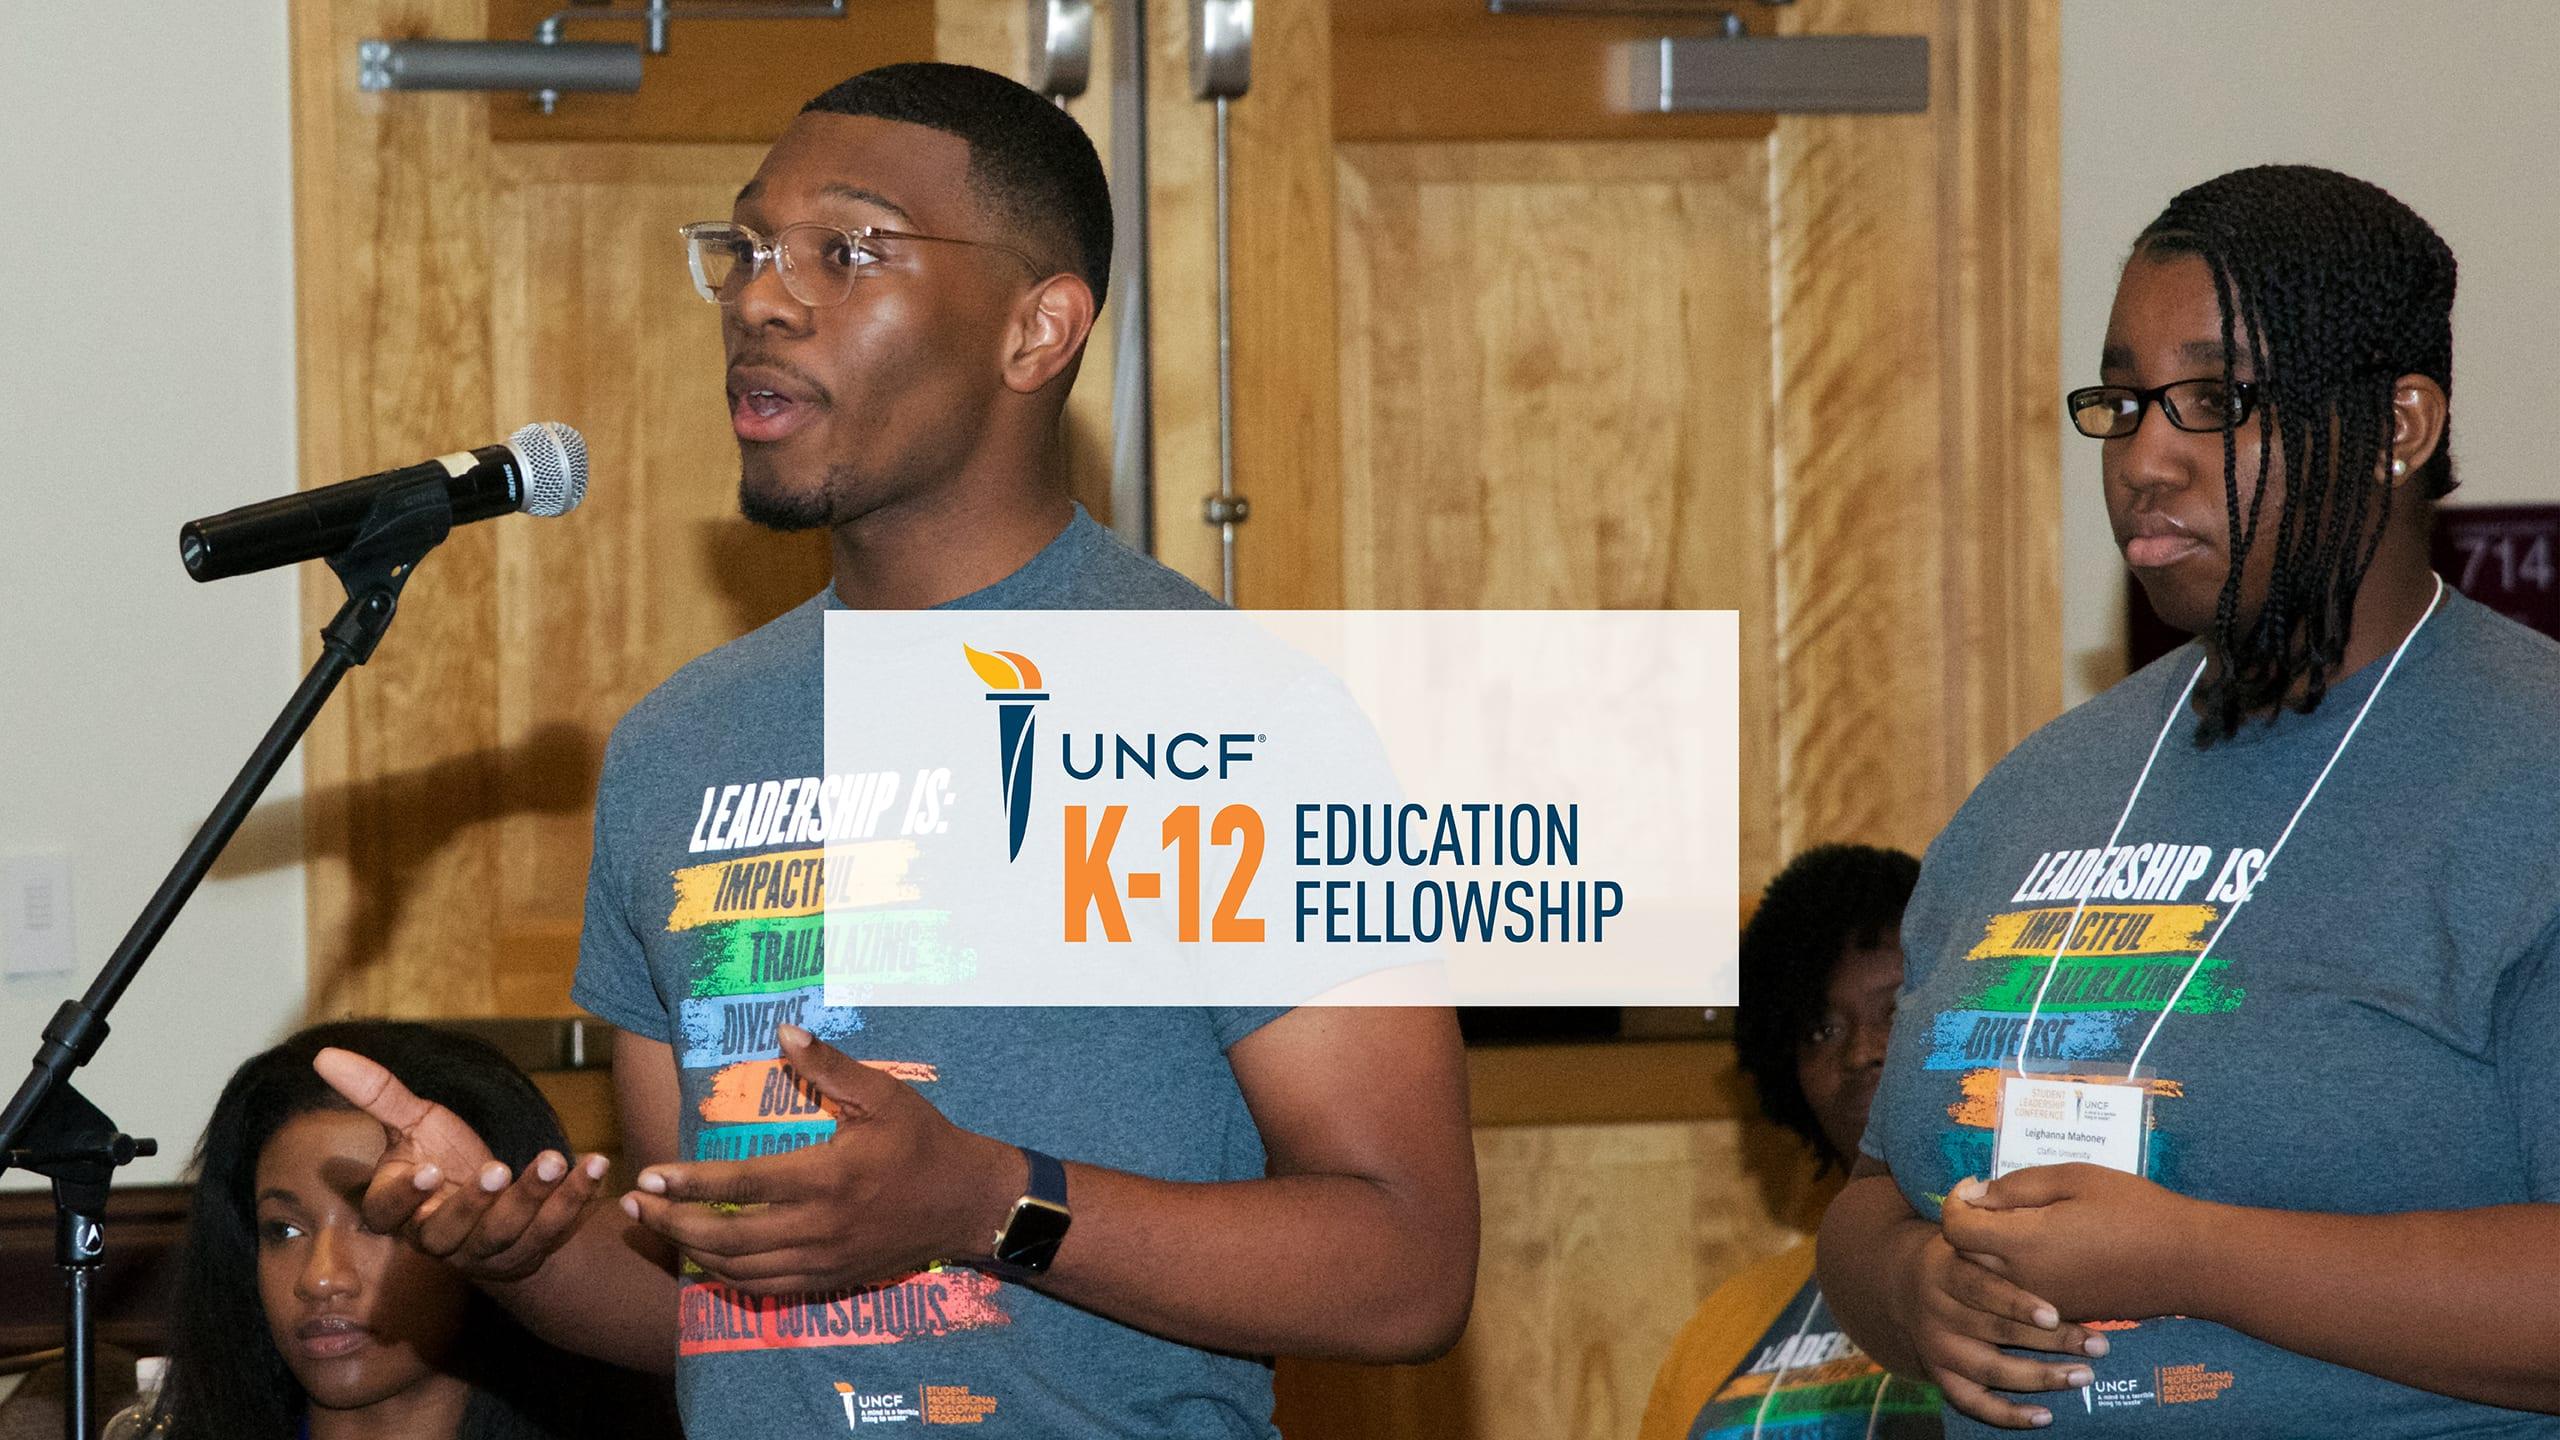 K-12 education fellowship hero image